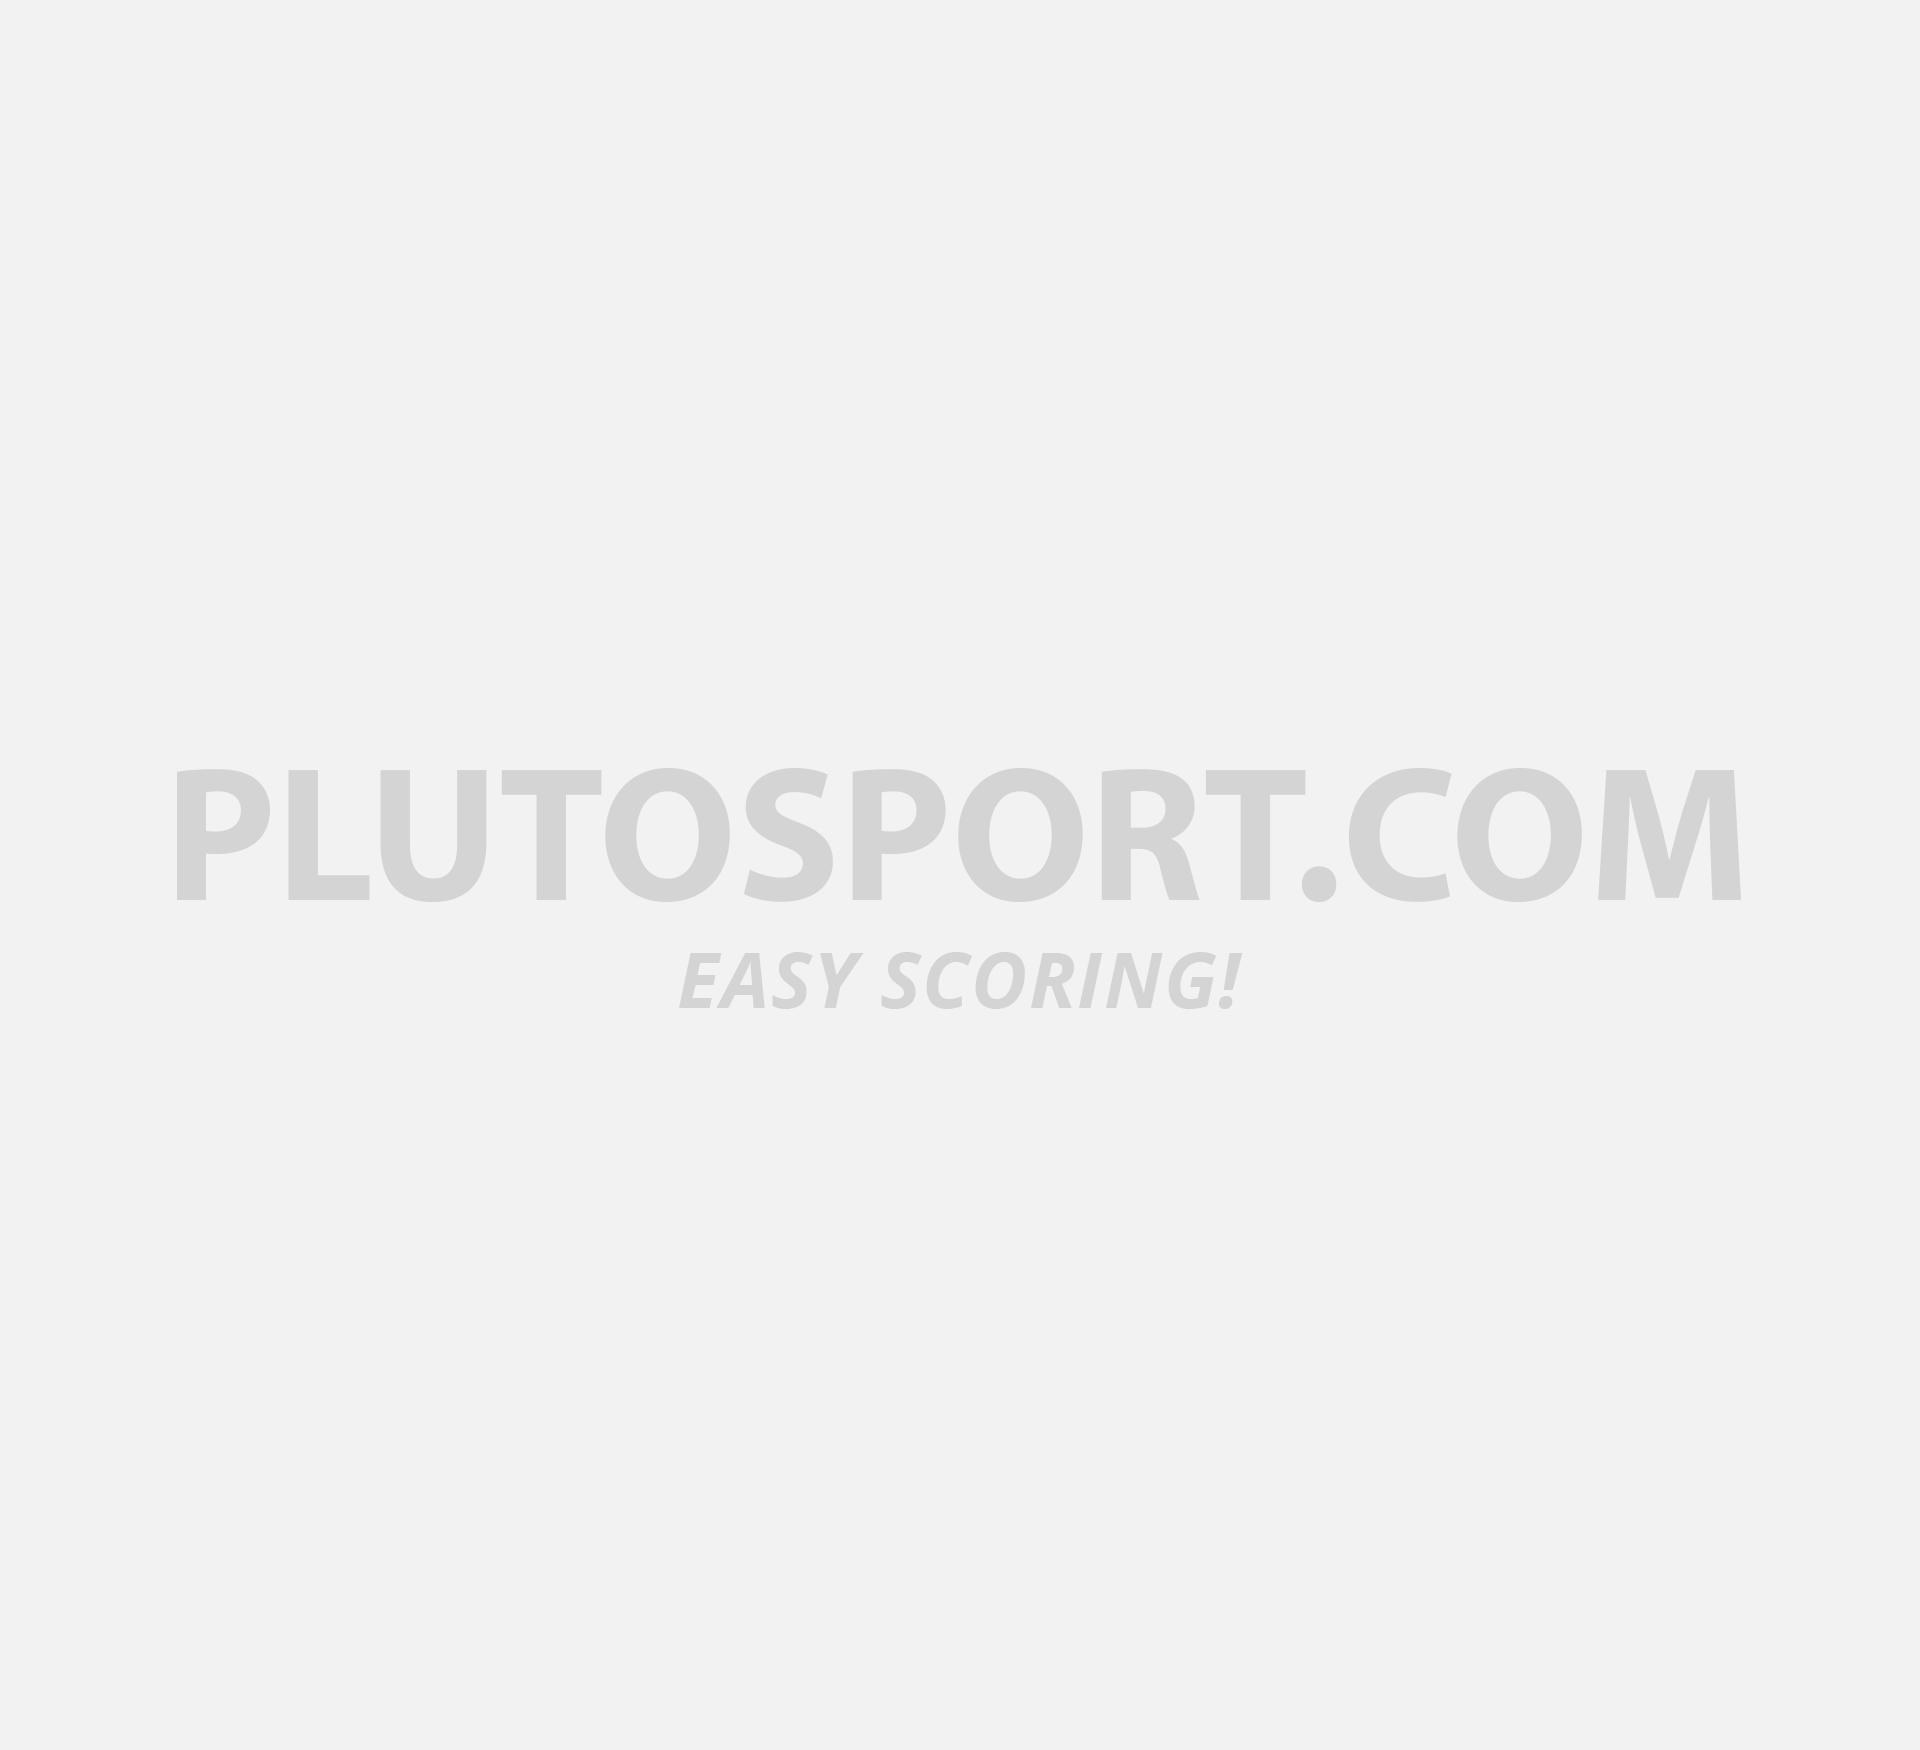 8b8d4823f Nike Juventus Home Kit Boys - Minikits - Clubs & Countries ...